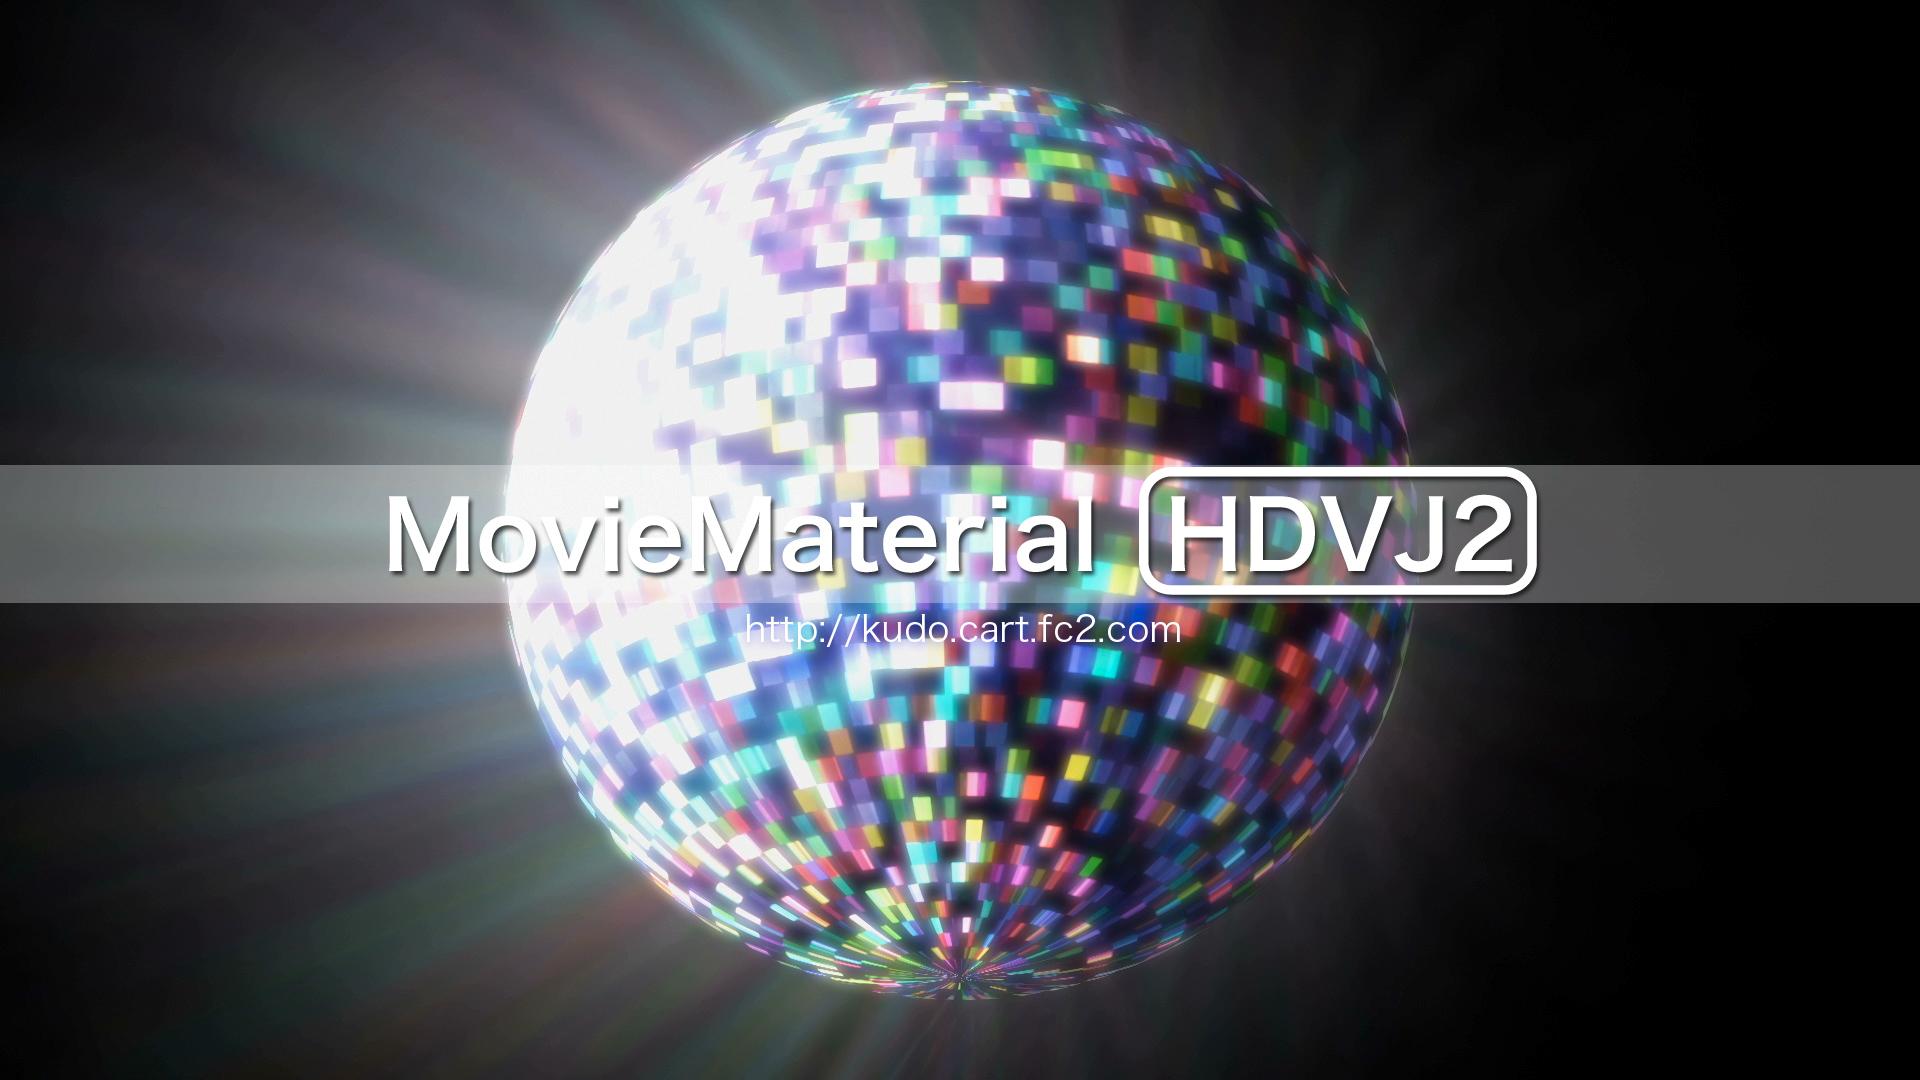 MovieMaterial HDVJ2 フルハイビジョンVJ動画素材集 画像2